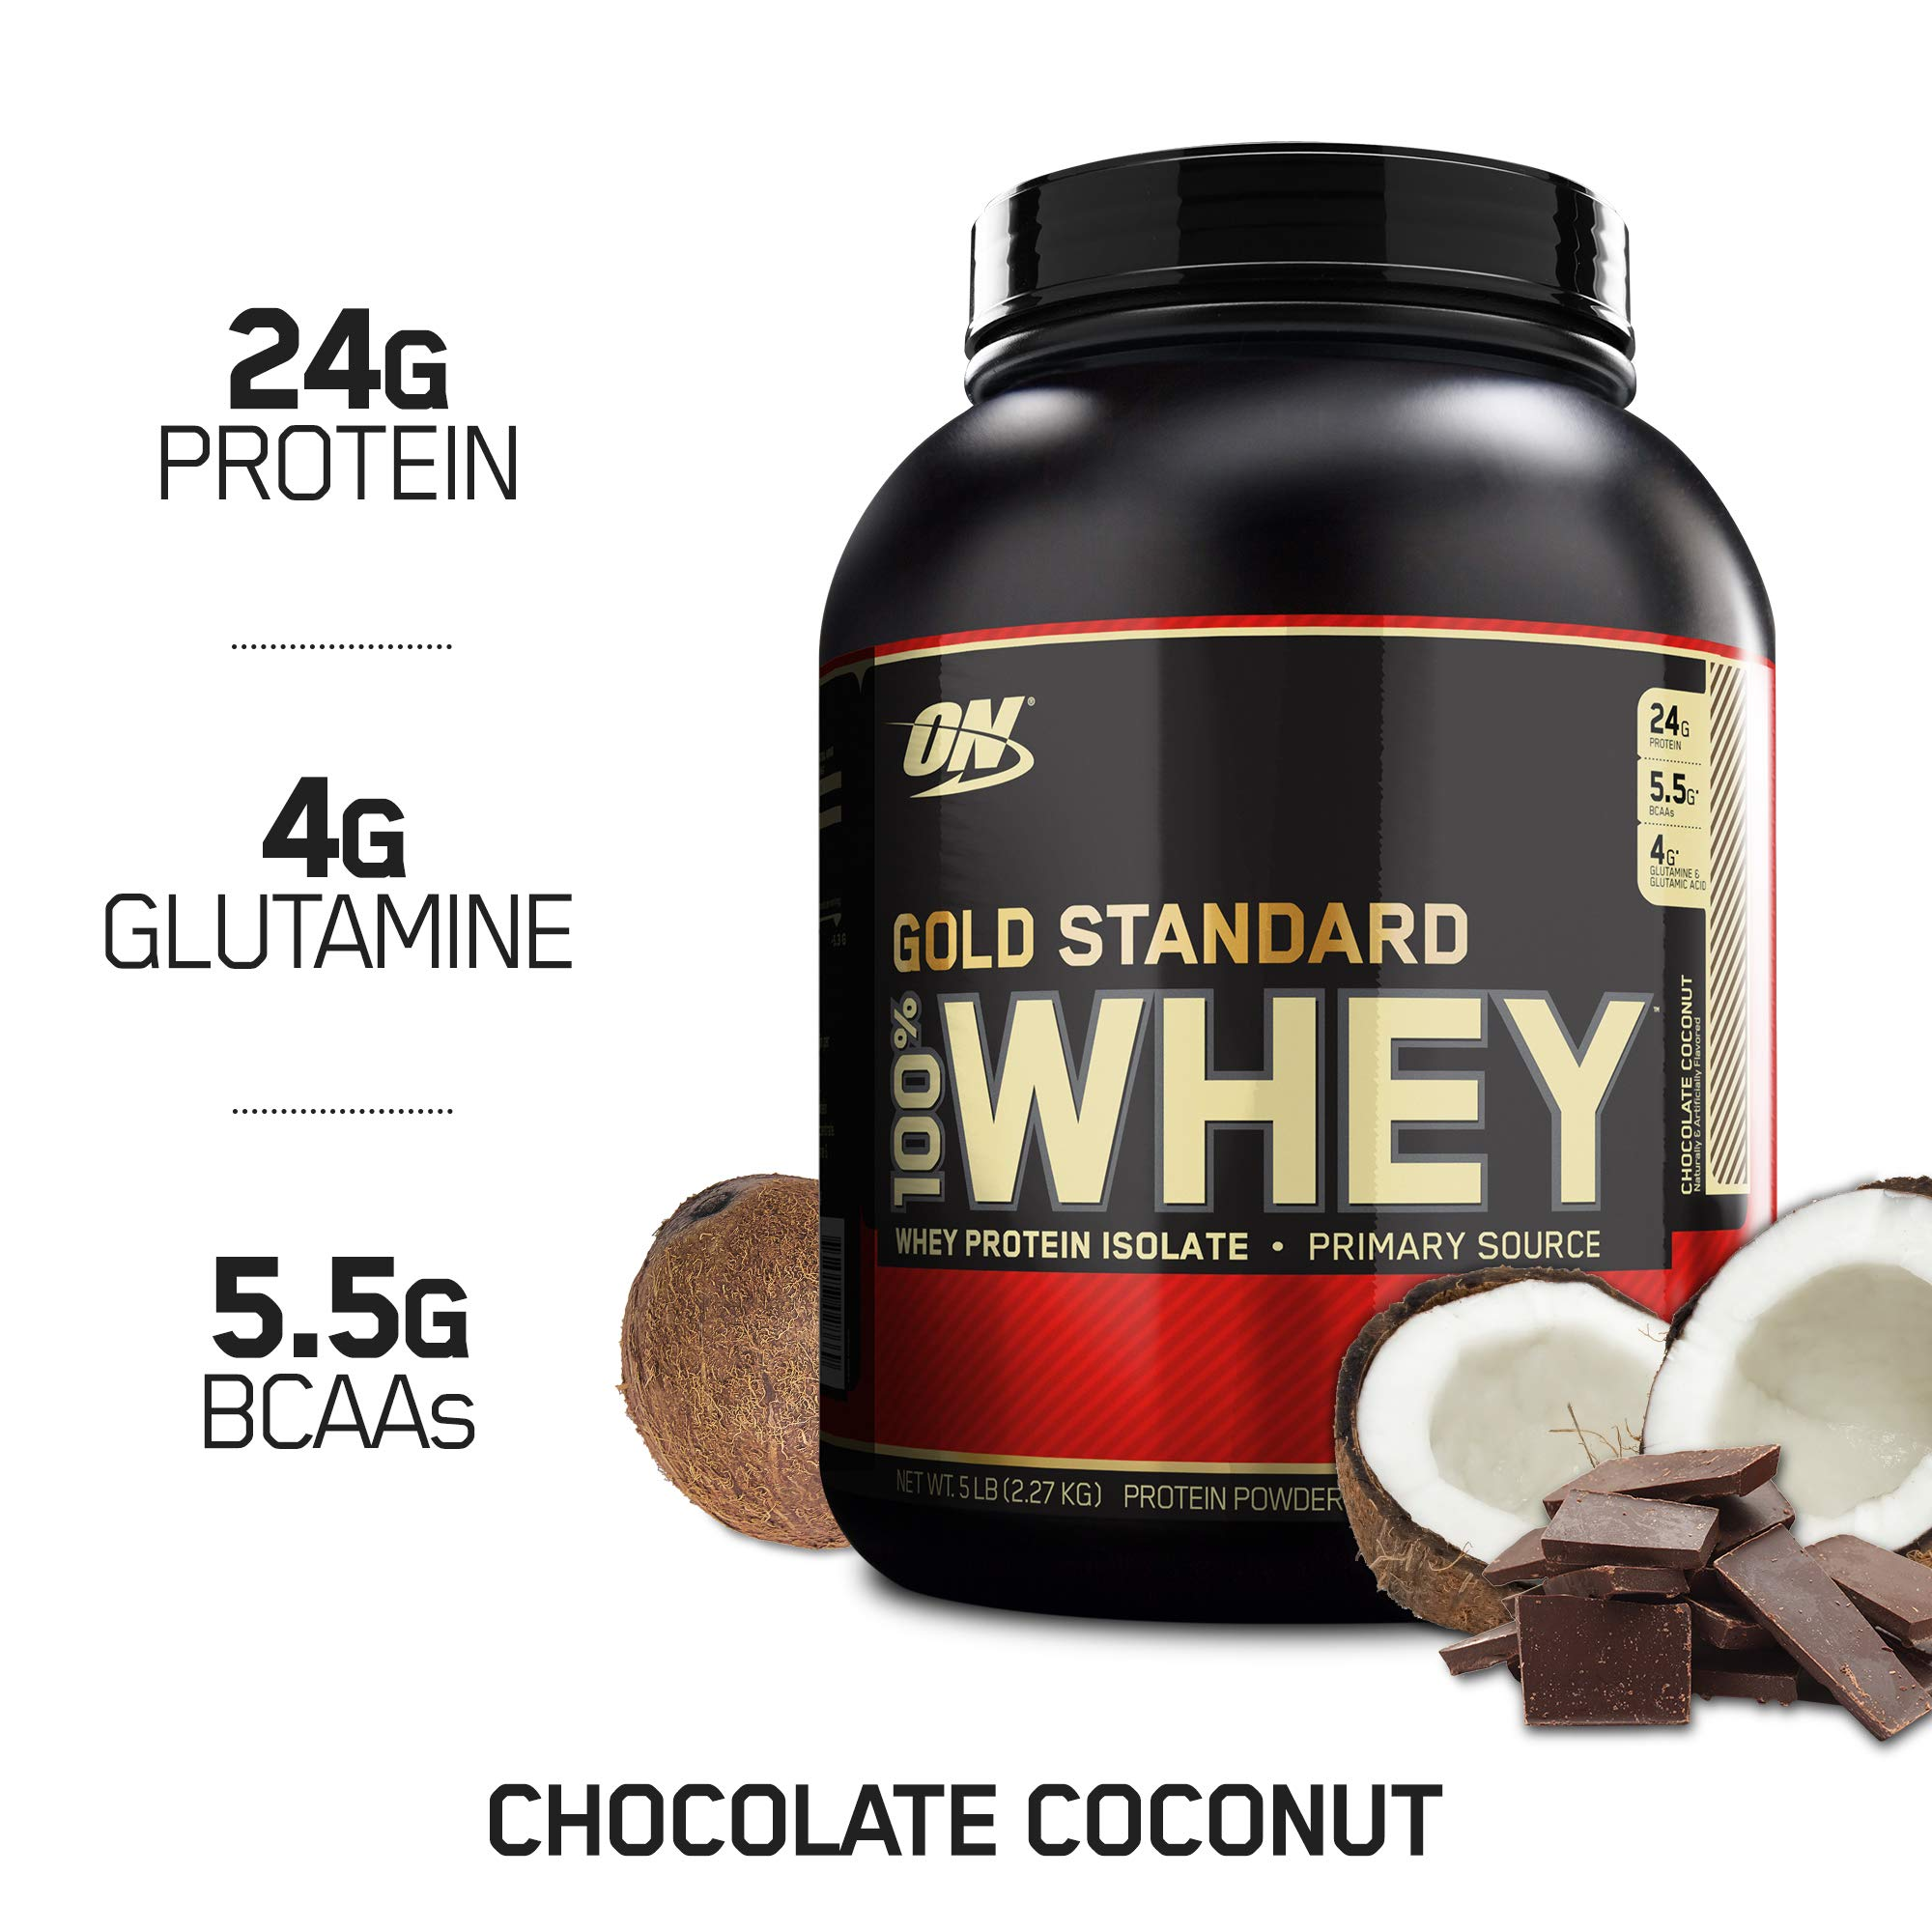 Optimum Nutrition Gold Standard 100% Whey Protein Powder, Chocolate Coconut, 5 Pound by Optimum Nutrition